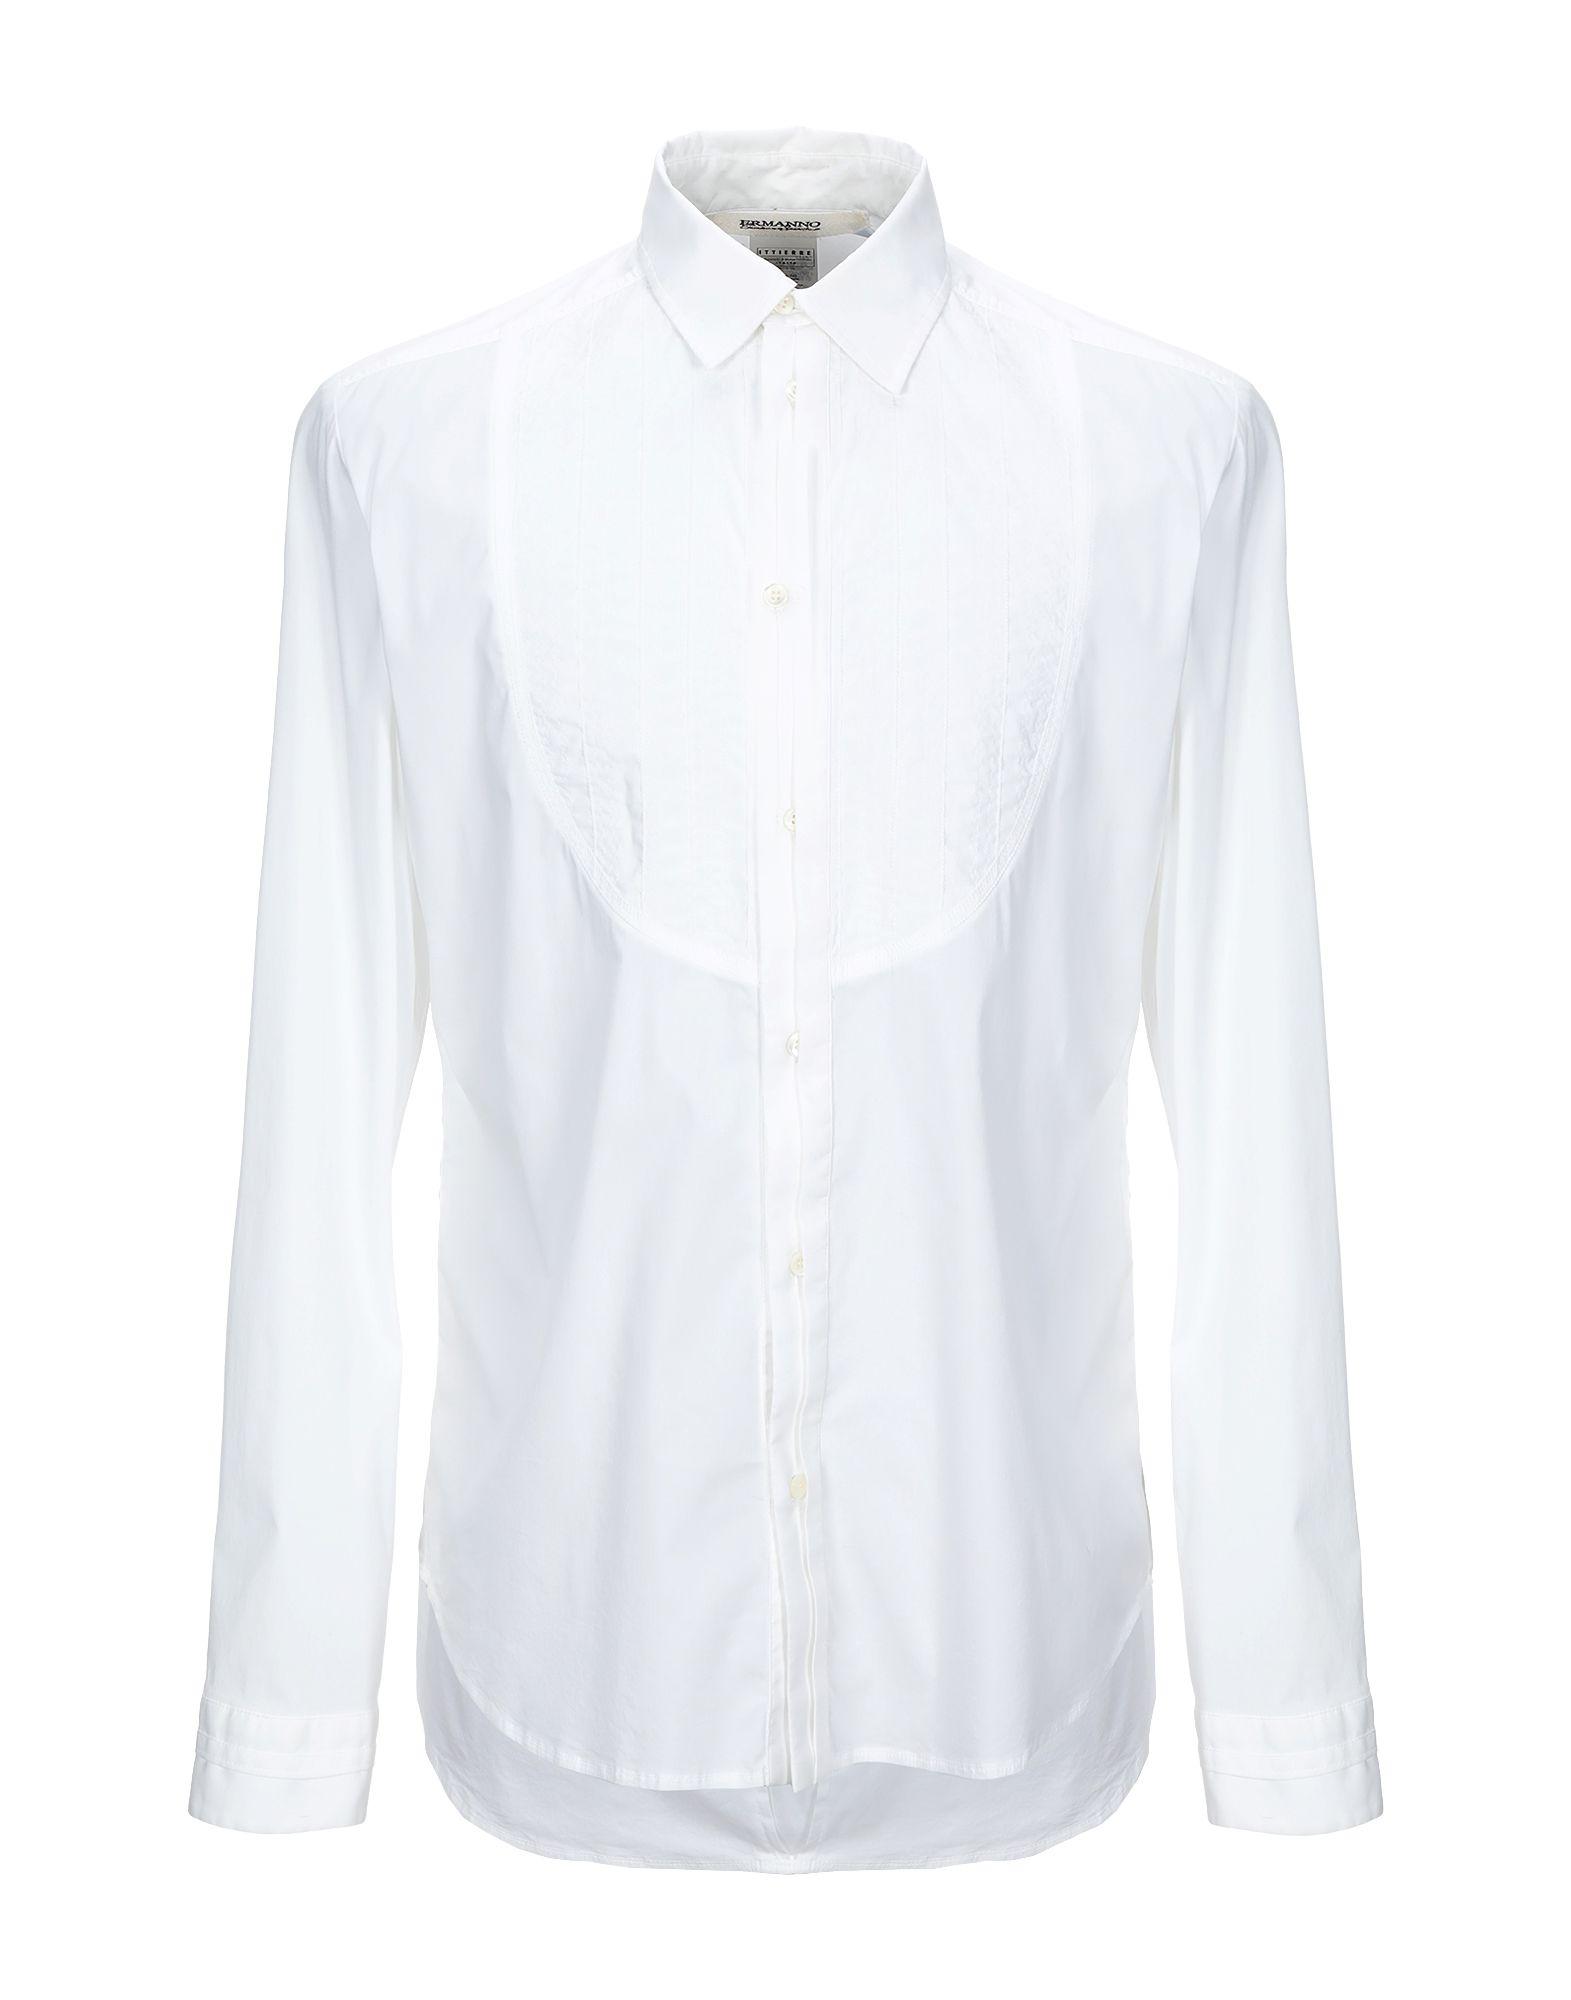 все цены на ERMANNO DI ERMANNO SCERVINO Pубашка онлайн